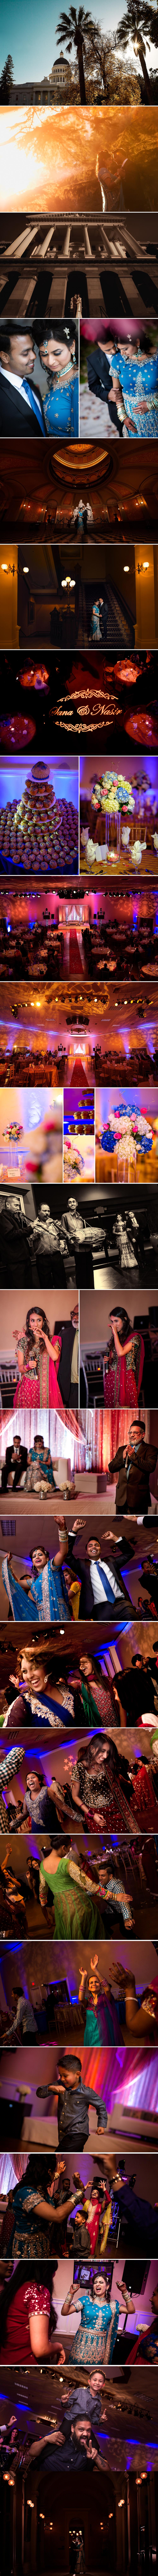 Sana Nasir Muslim Wedding Sacramento.jpg